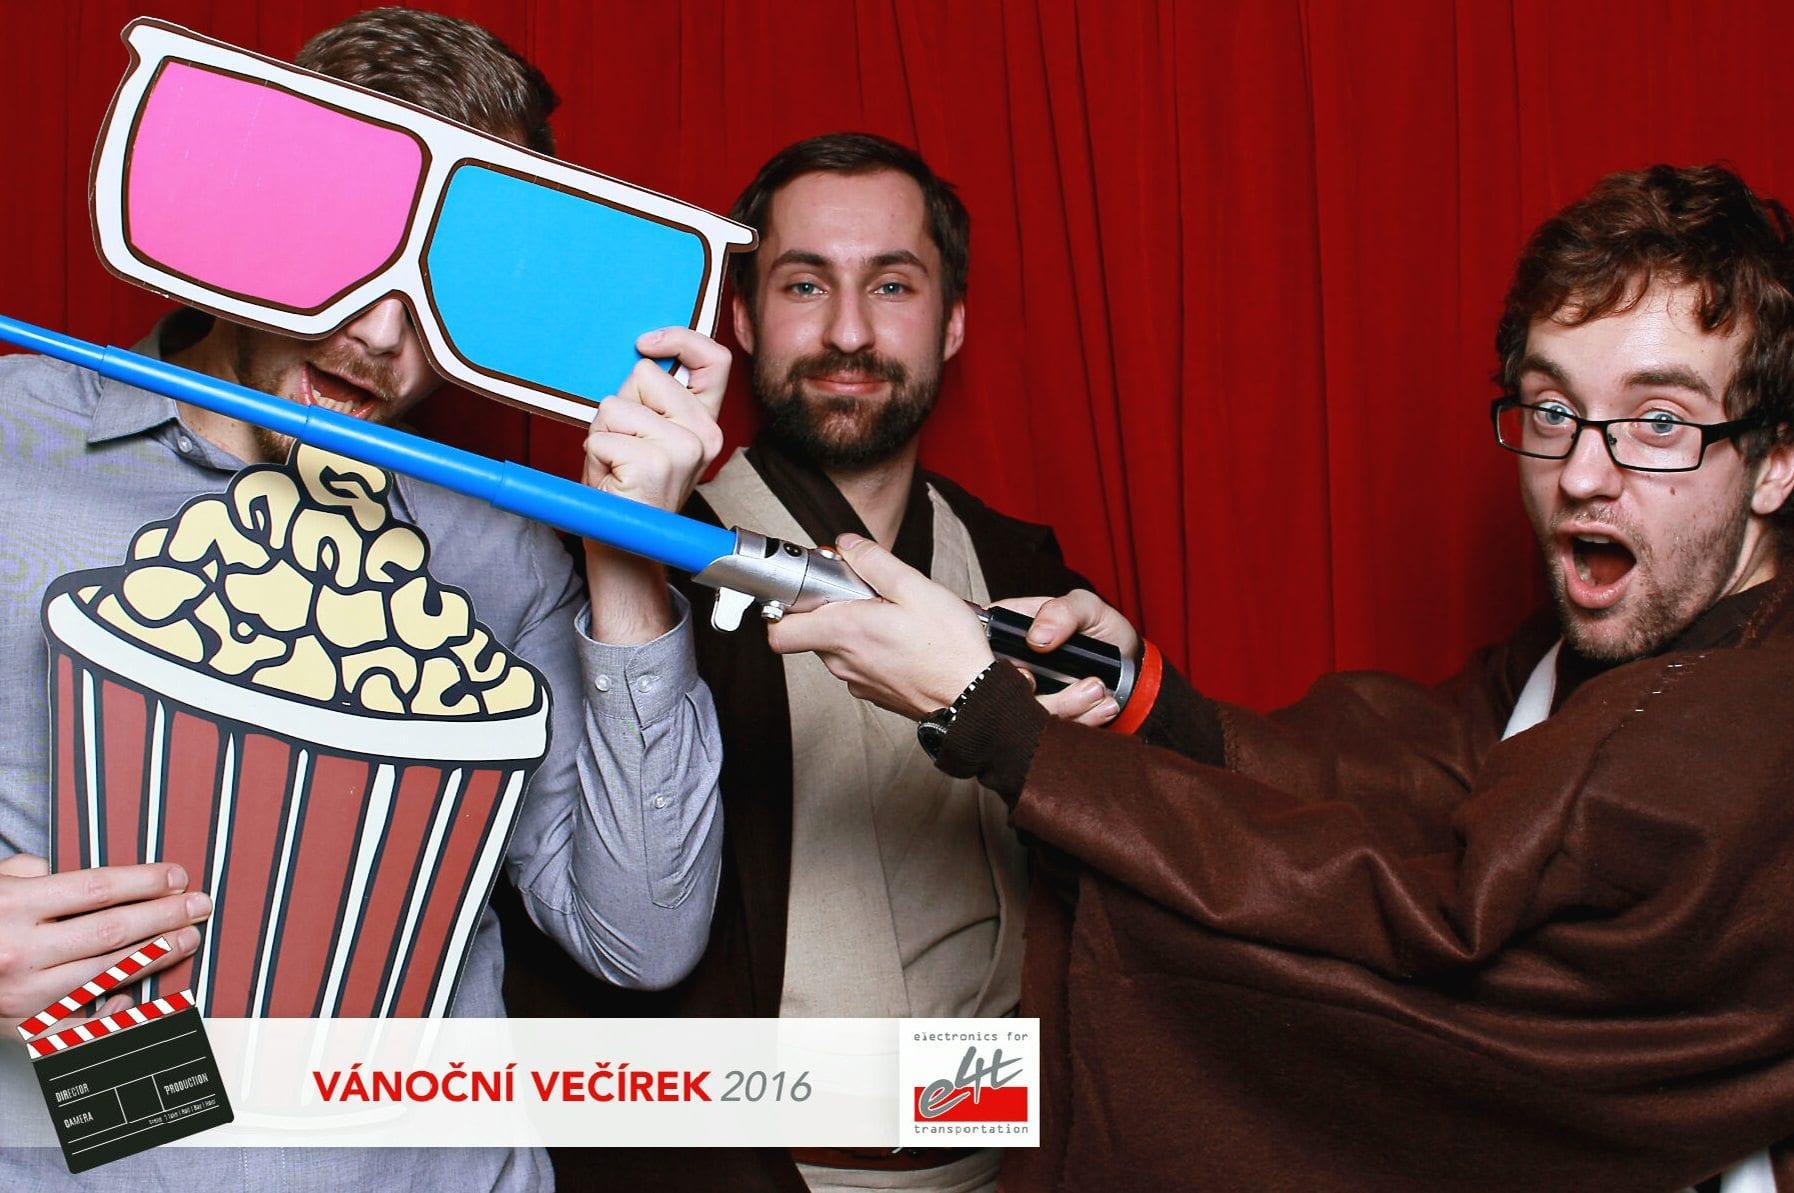 fotokoutek-e4t-vanocni-vecirek-14-12-2016-186284